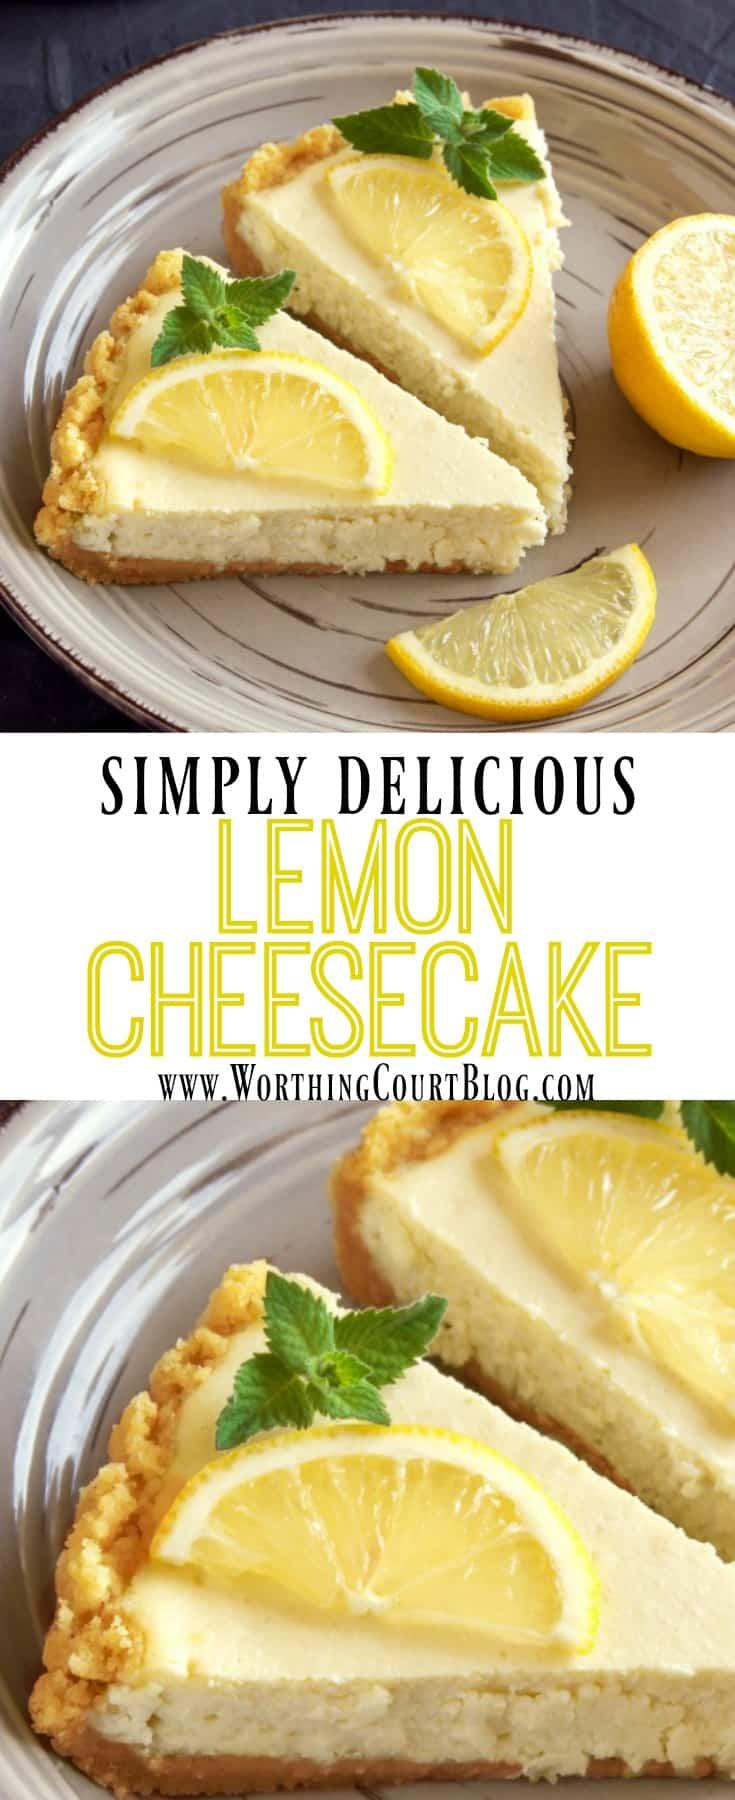 An easy recipe for lemon cheesecake || Worthing Court